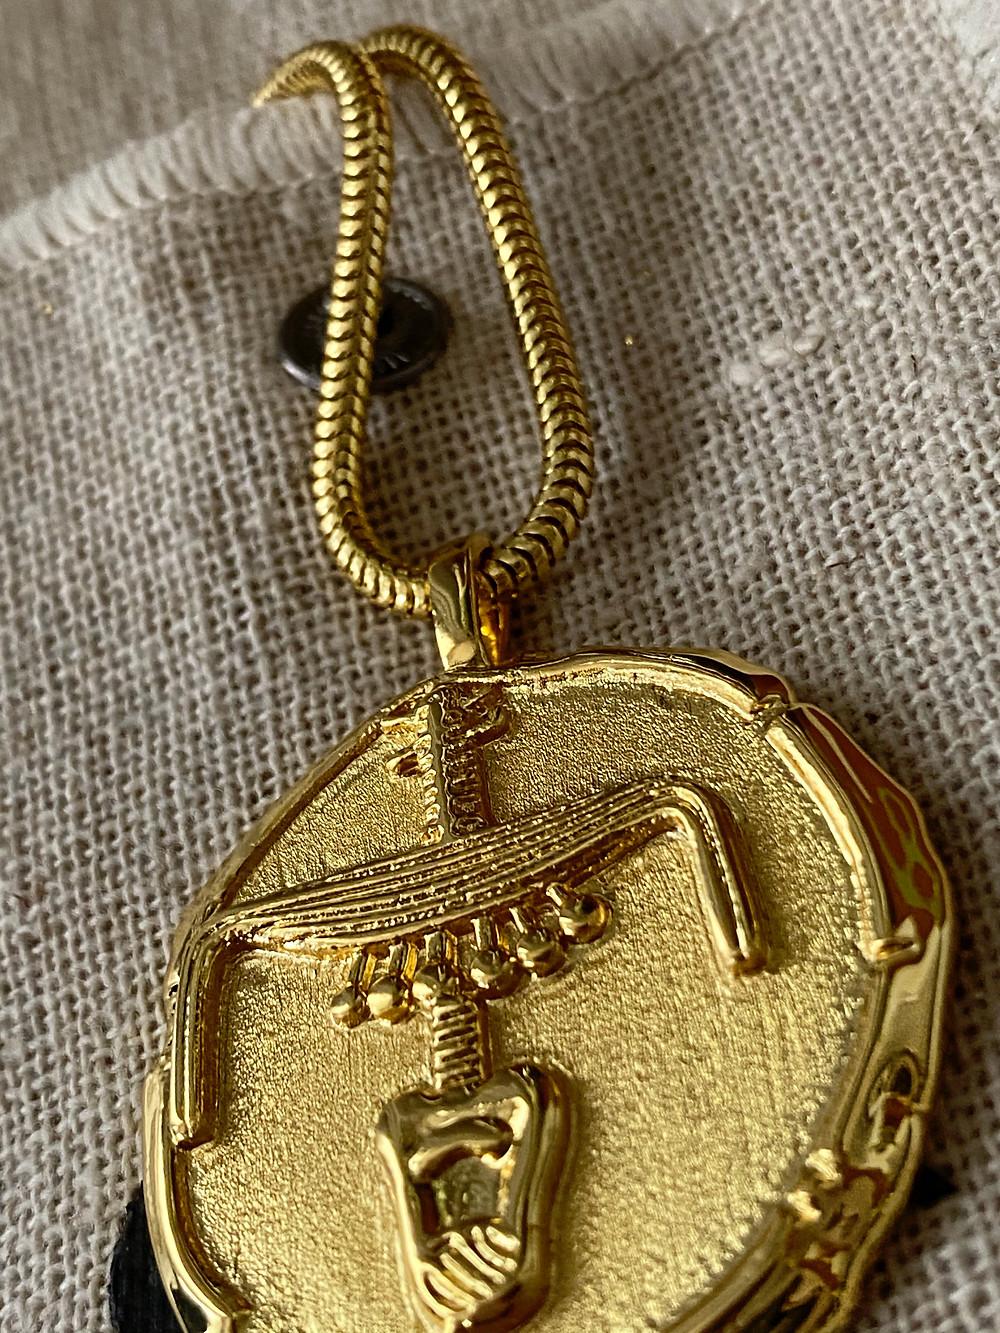 Black Jewelry Designer Gypsy by Knature